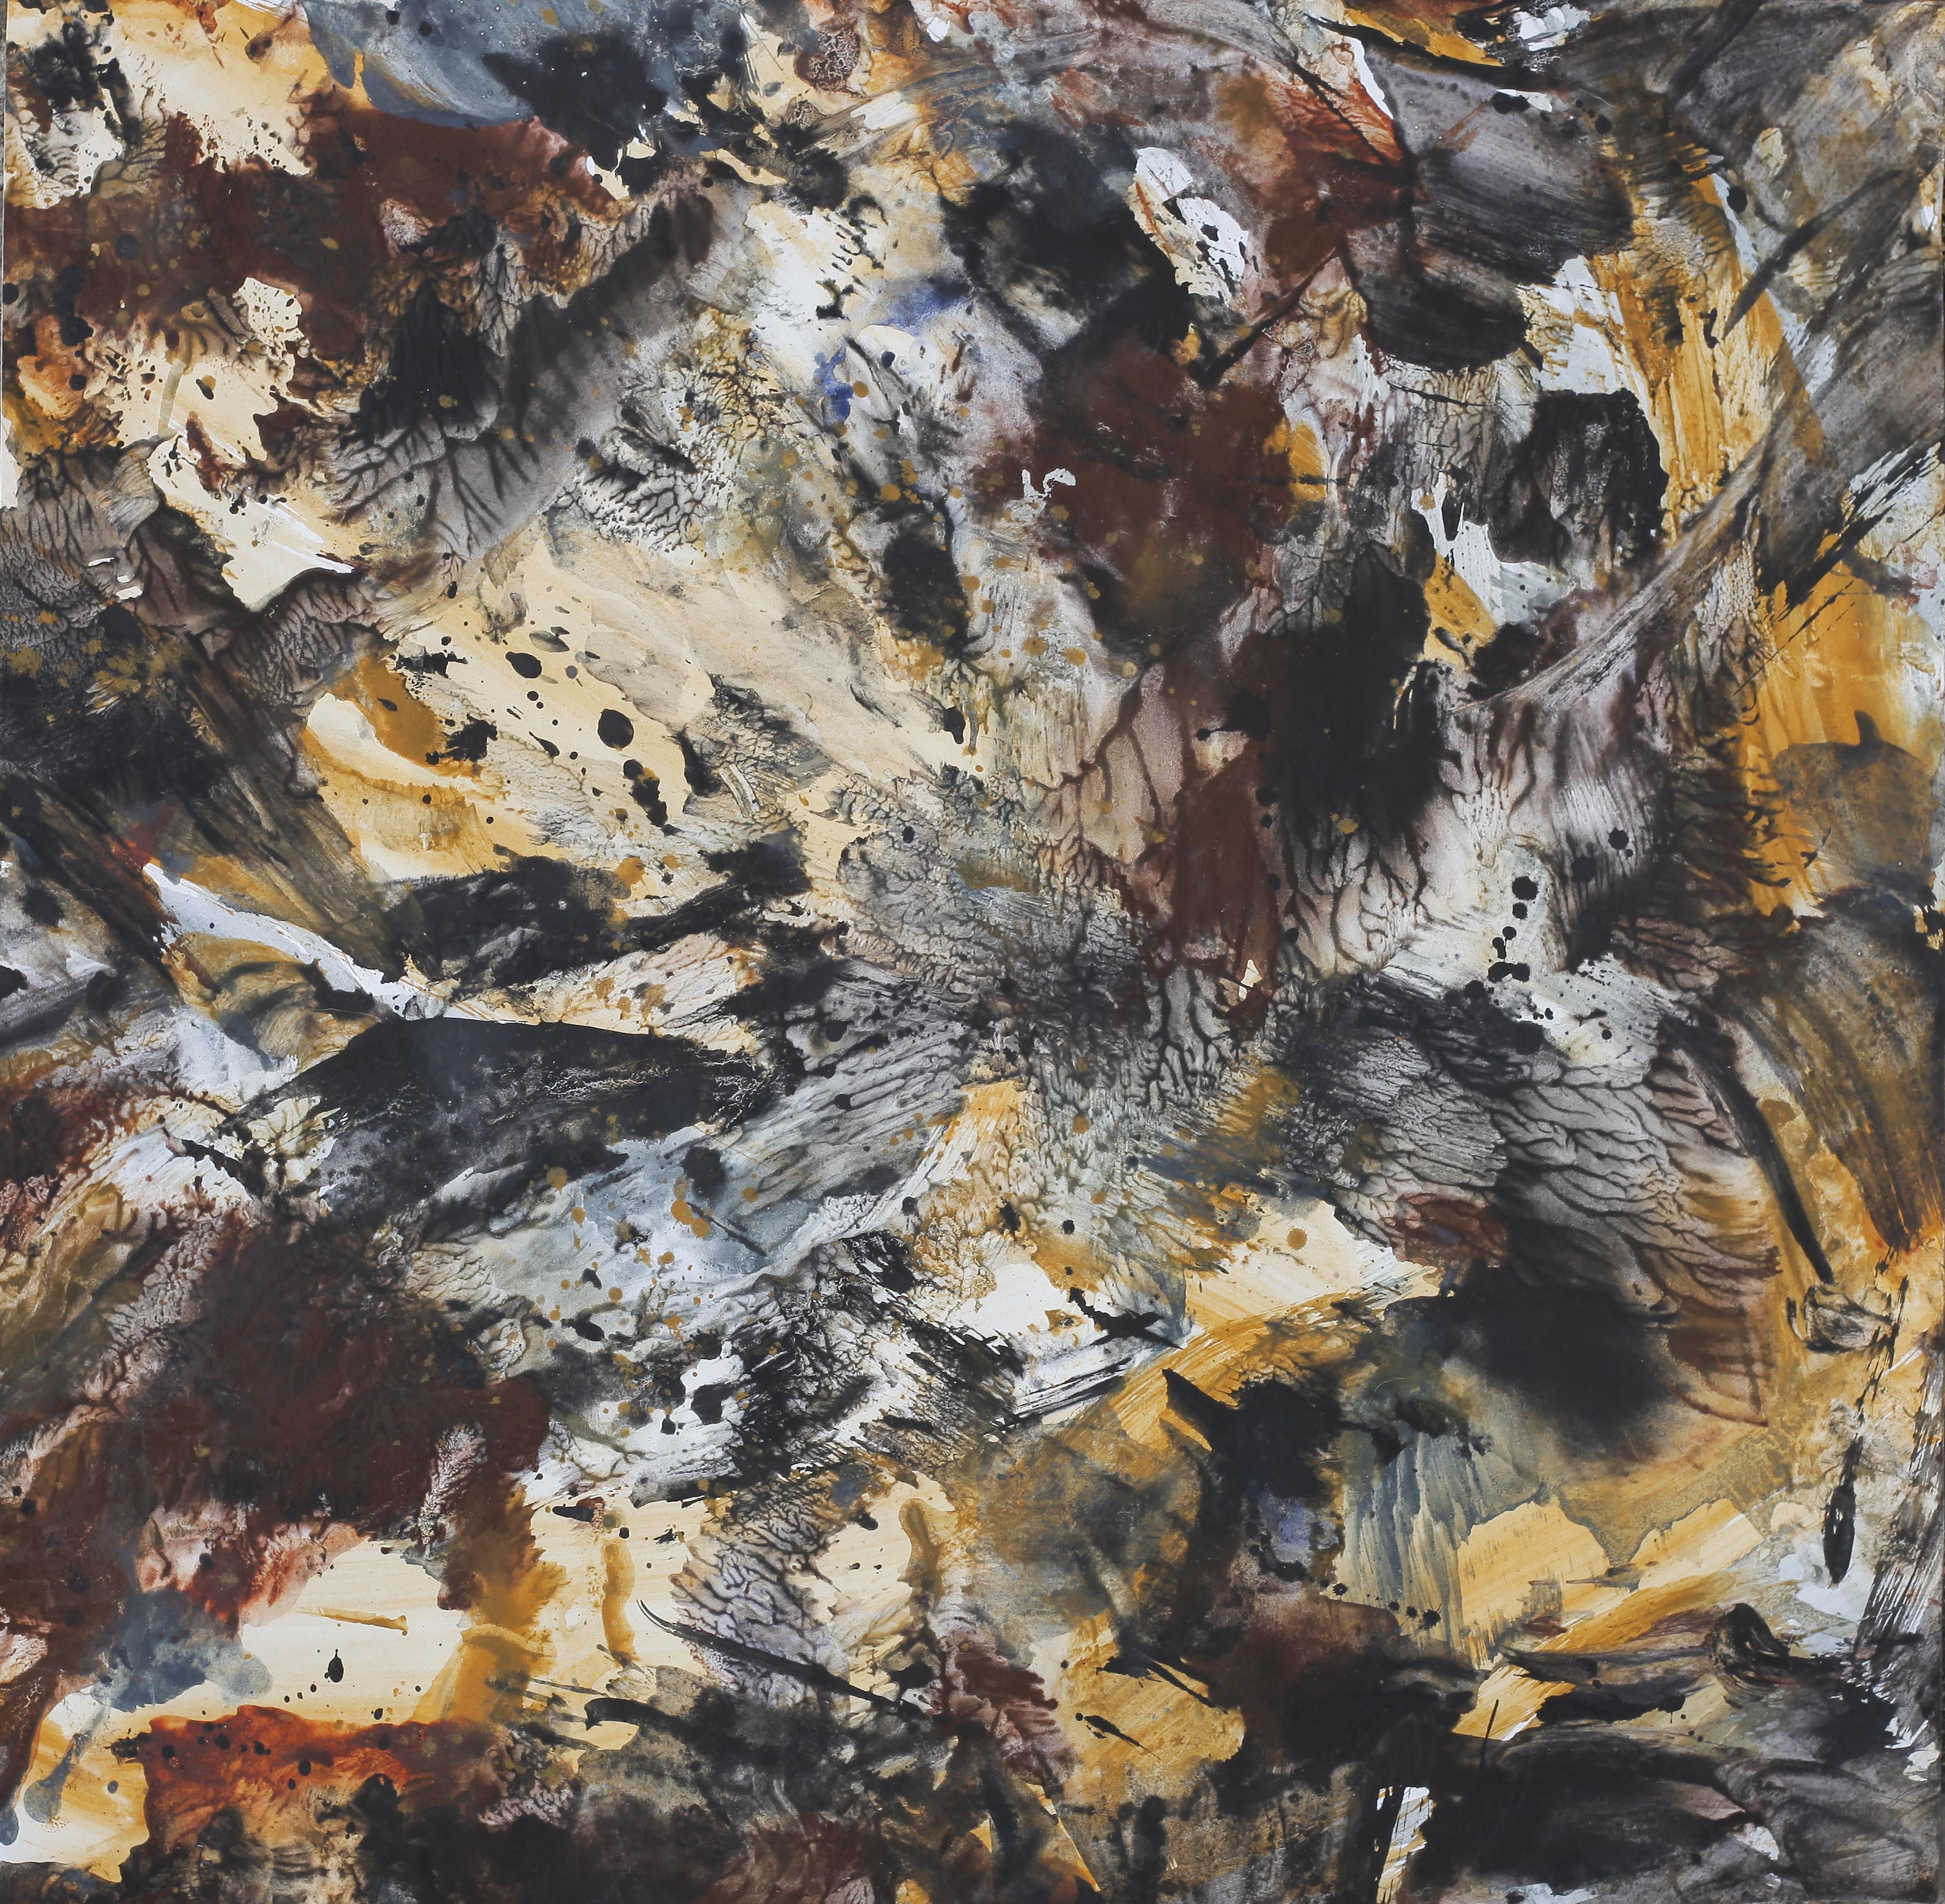 Yu Zhao, Tumult, tempera/paper/canvas, 30x30cm, 2019